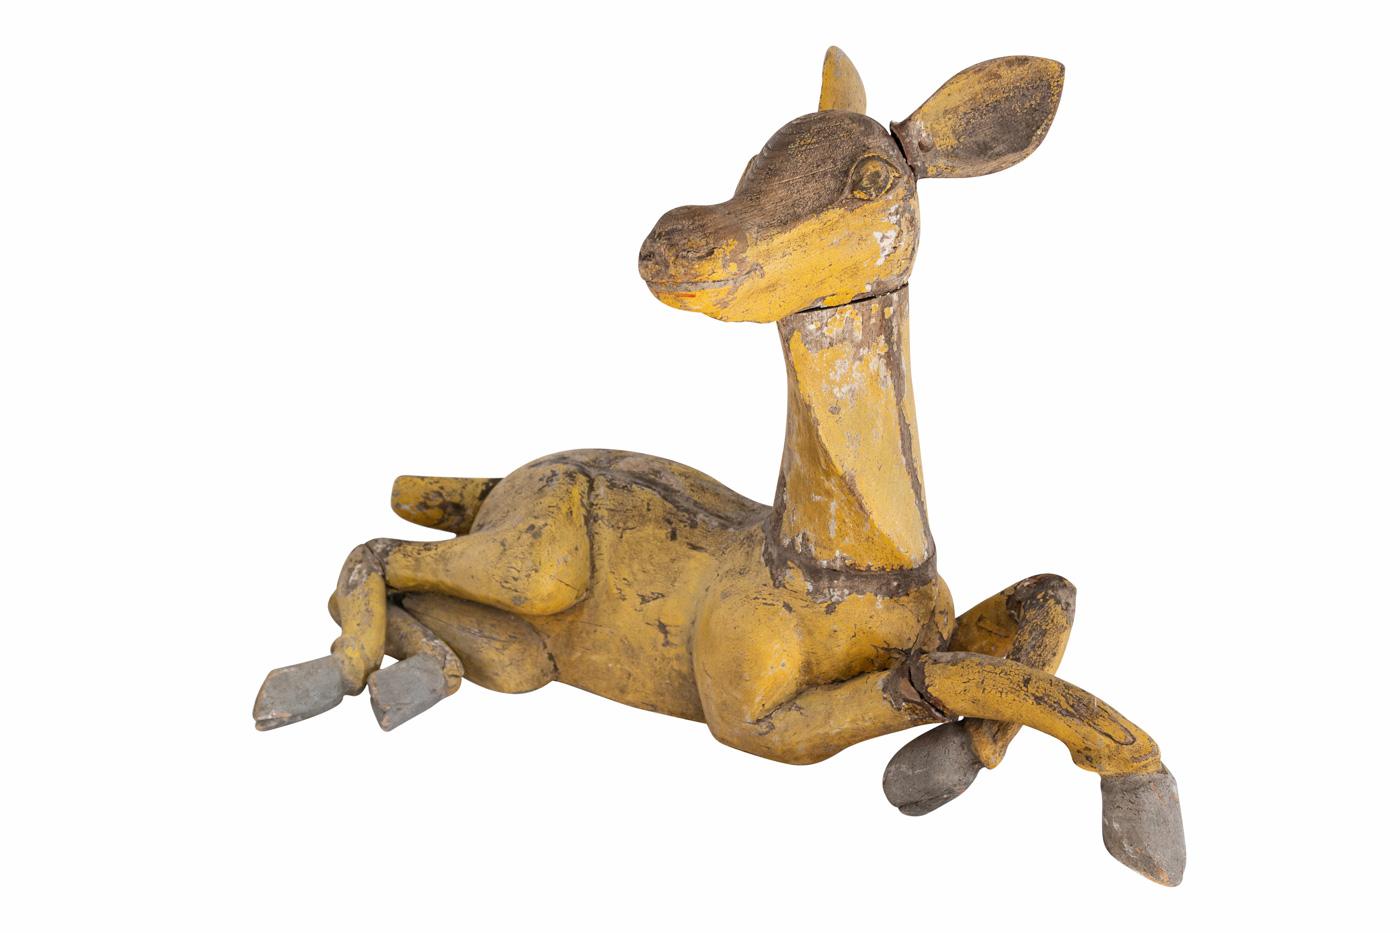 Escultura de ciervo tallado en madera